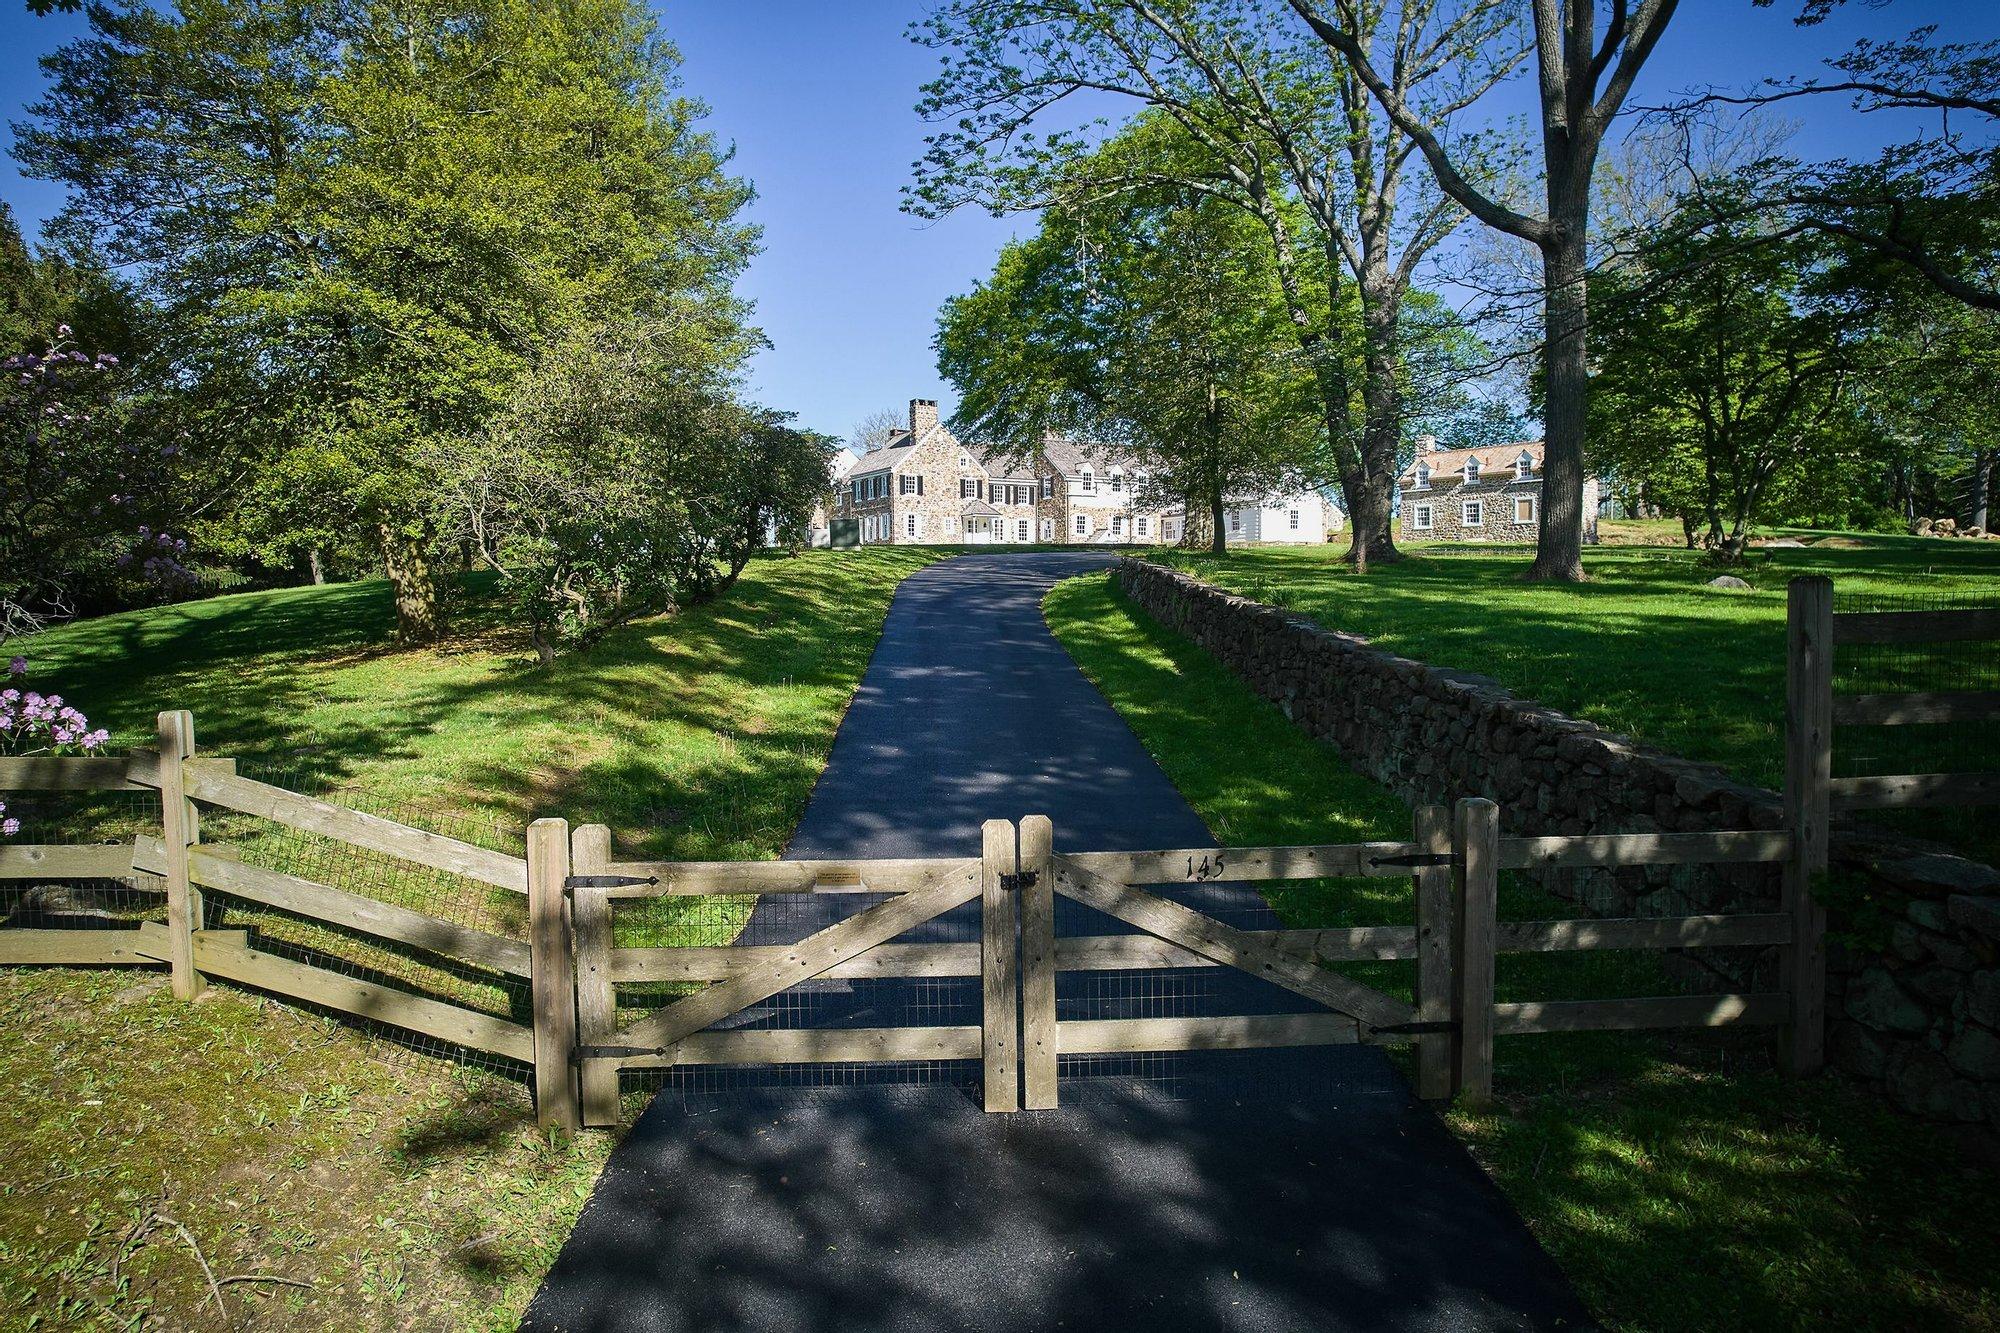 House in Malvern, Pennsylvania, United States 1